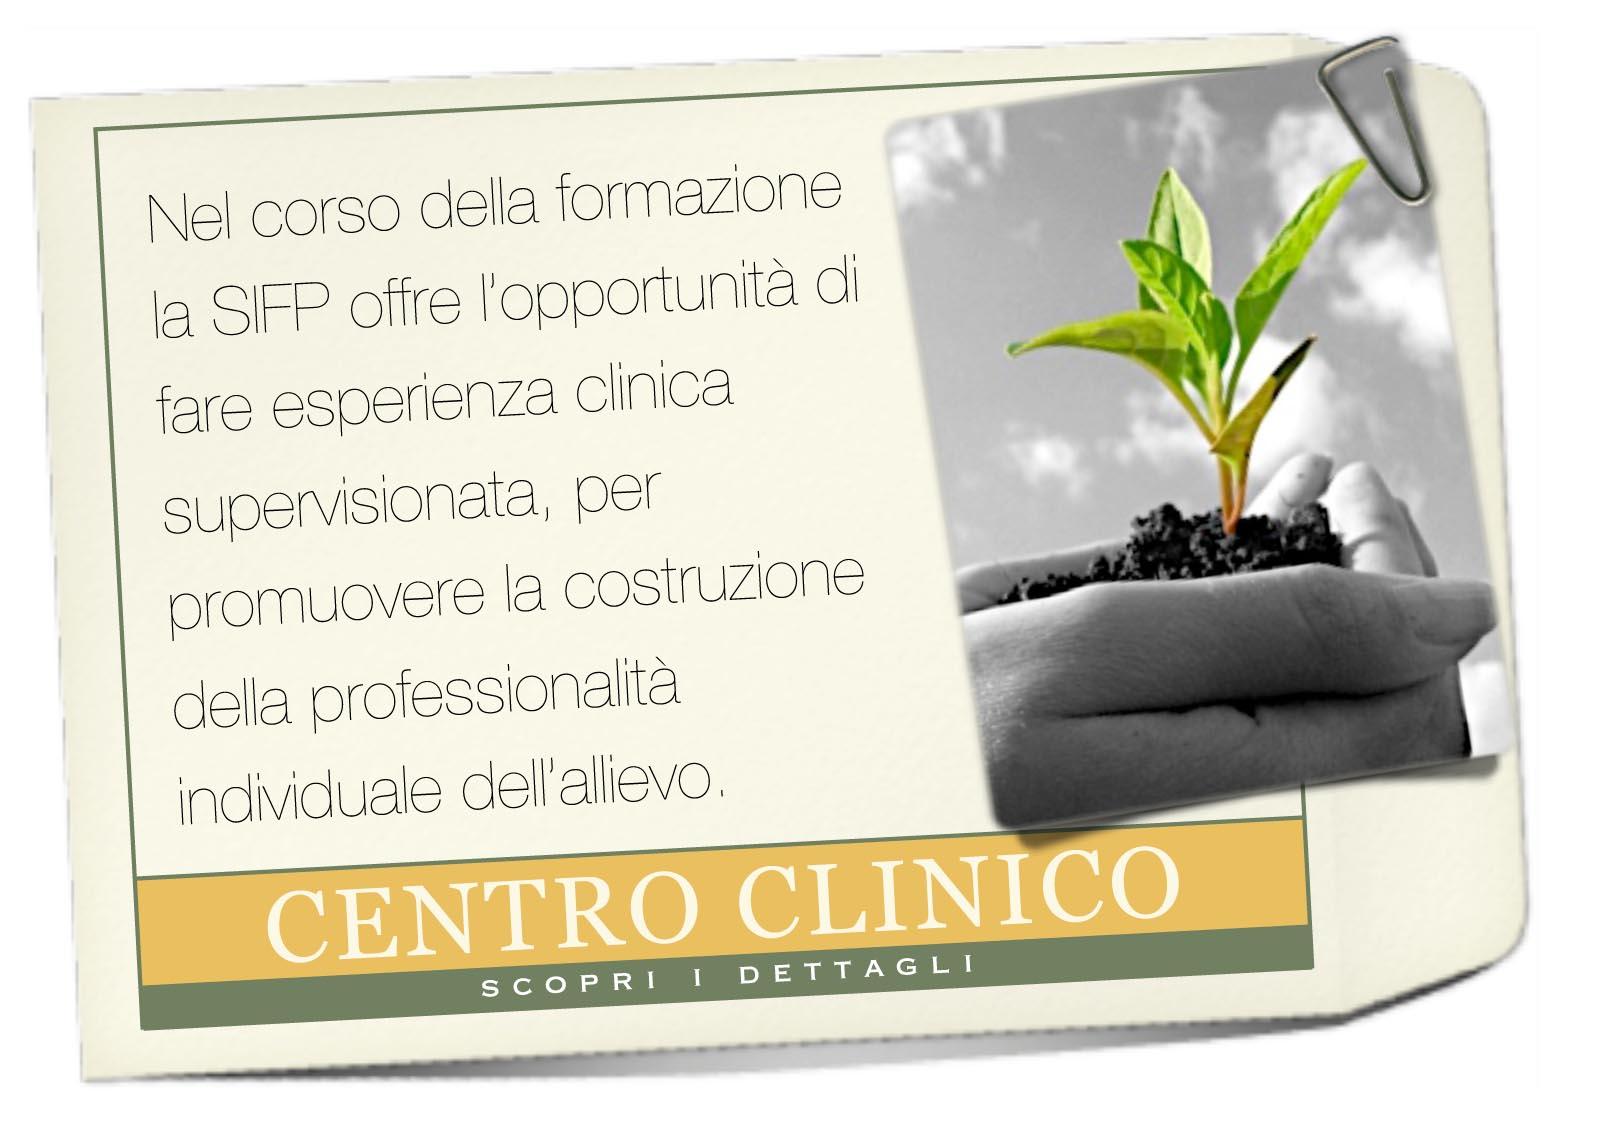 CentroClinico